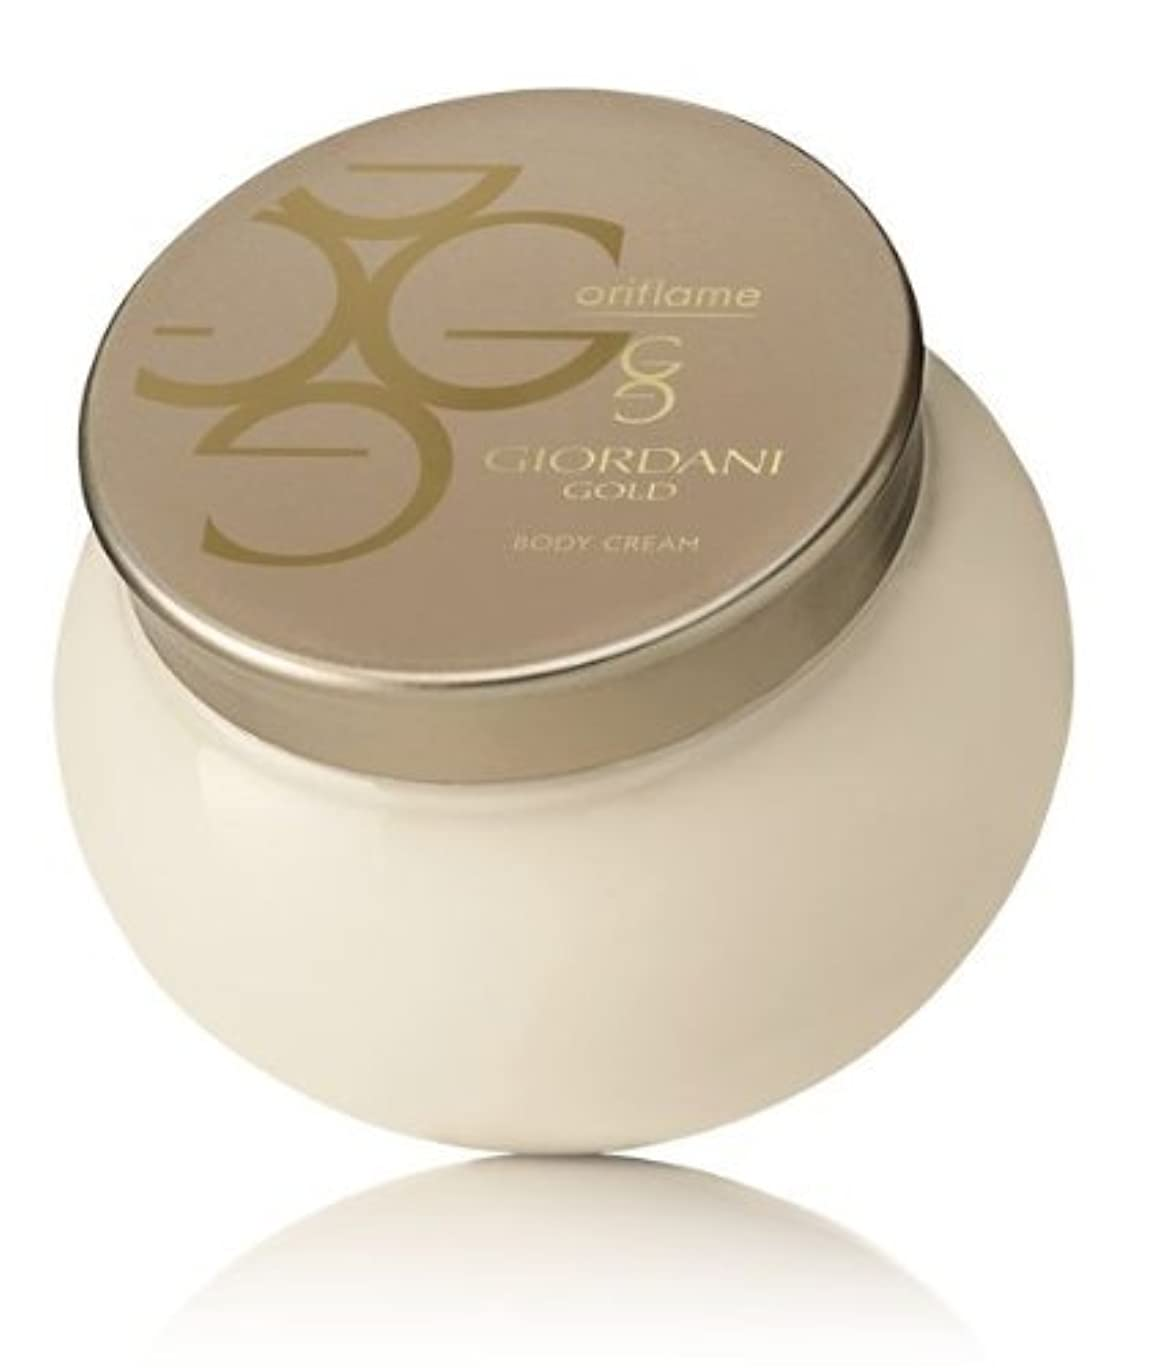 Giordani Gold Body Cream by Oriflame